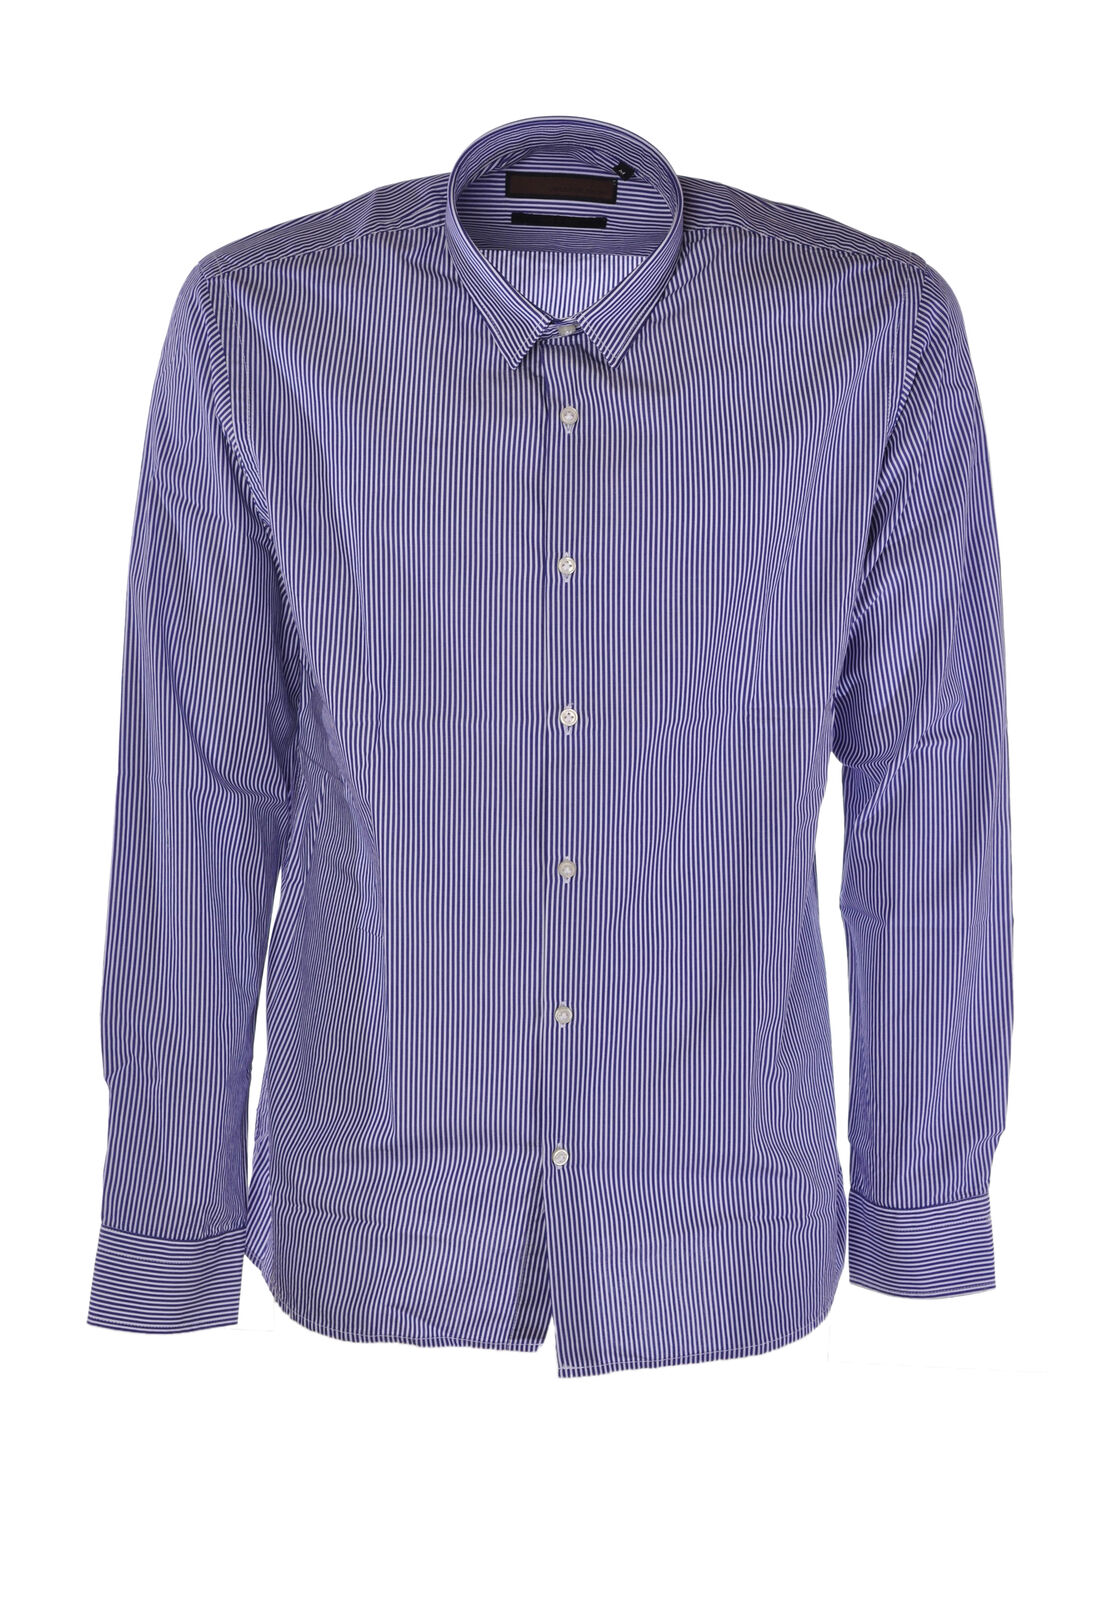 Laboratori Italiani  -  Shirts - Male - Fantasy - 3435820A185332